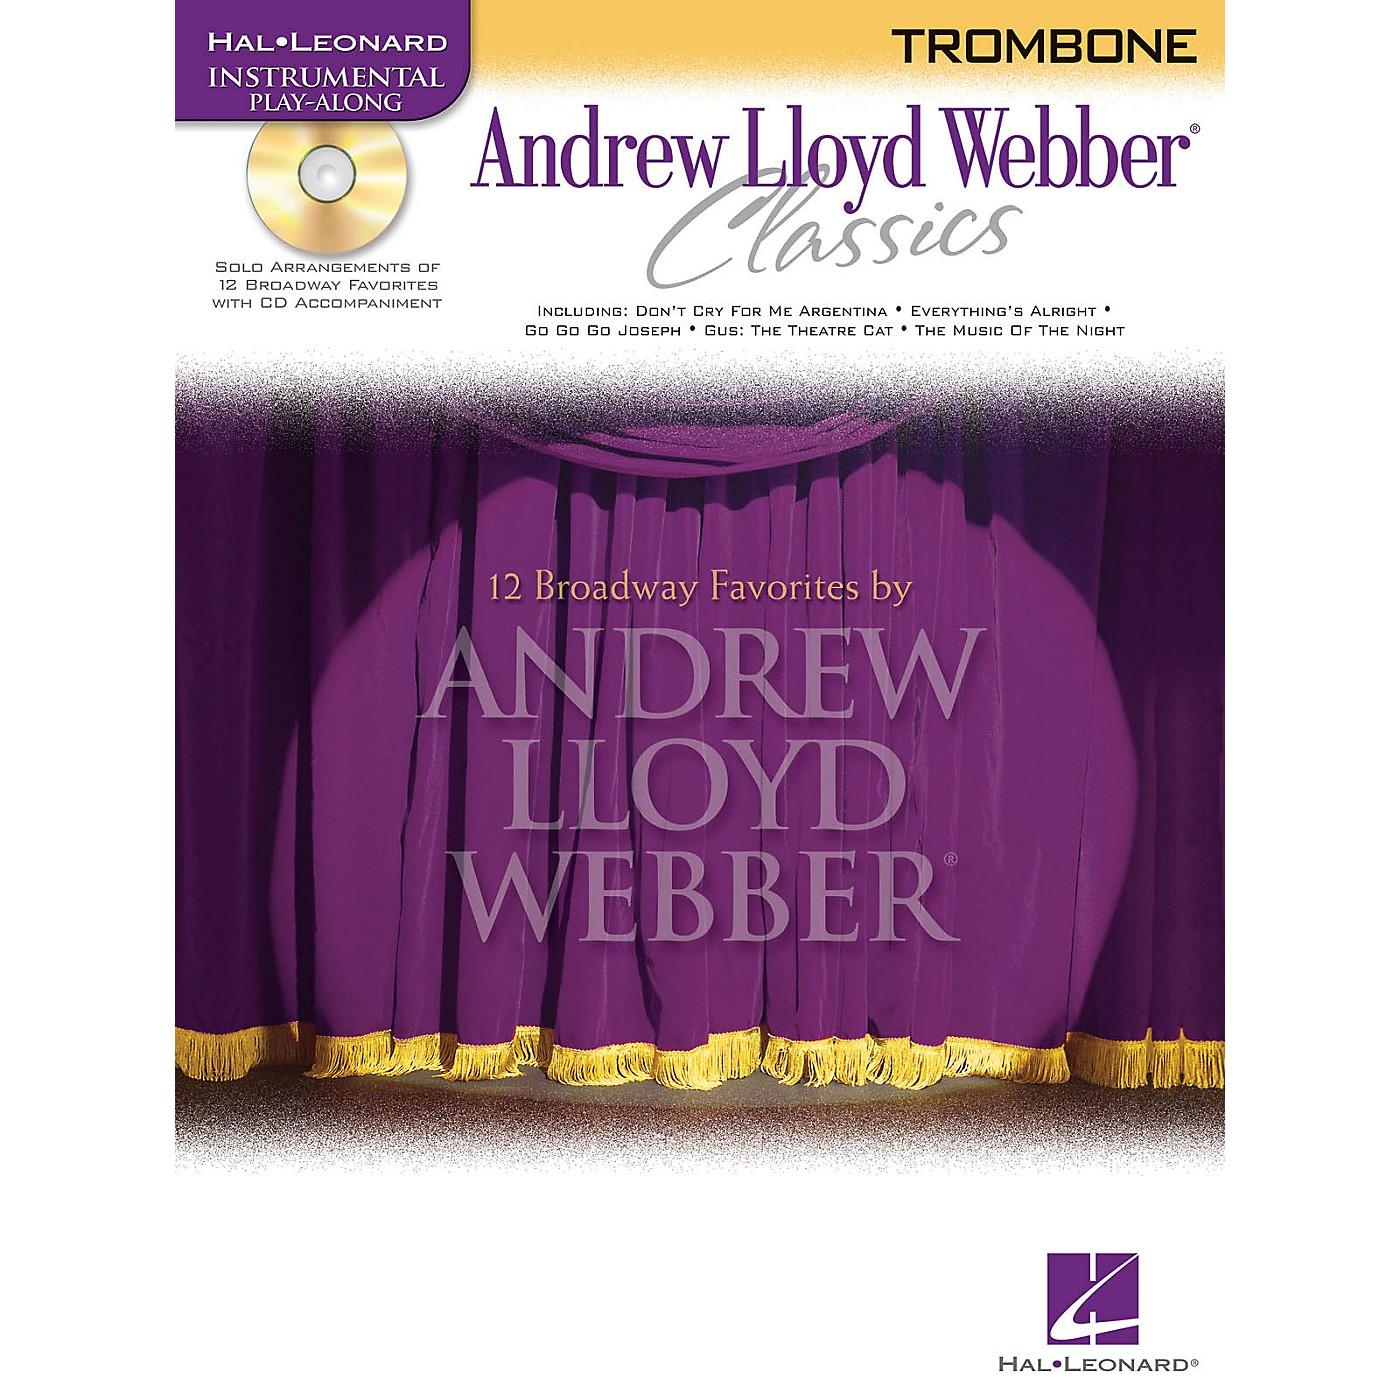 Hal Leonard Andrew Lloyd Webber Classics - Trombone Instrumental Play-Along Series Softcover with CD thumbnail